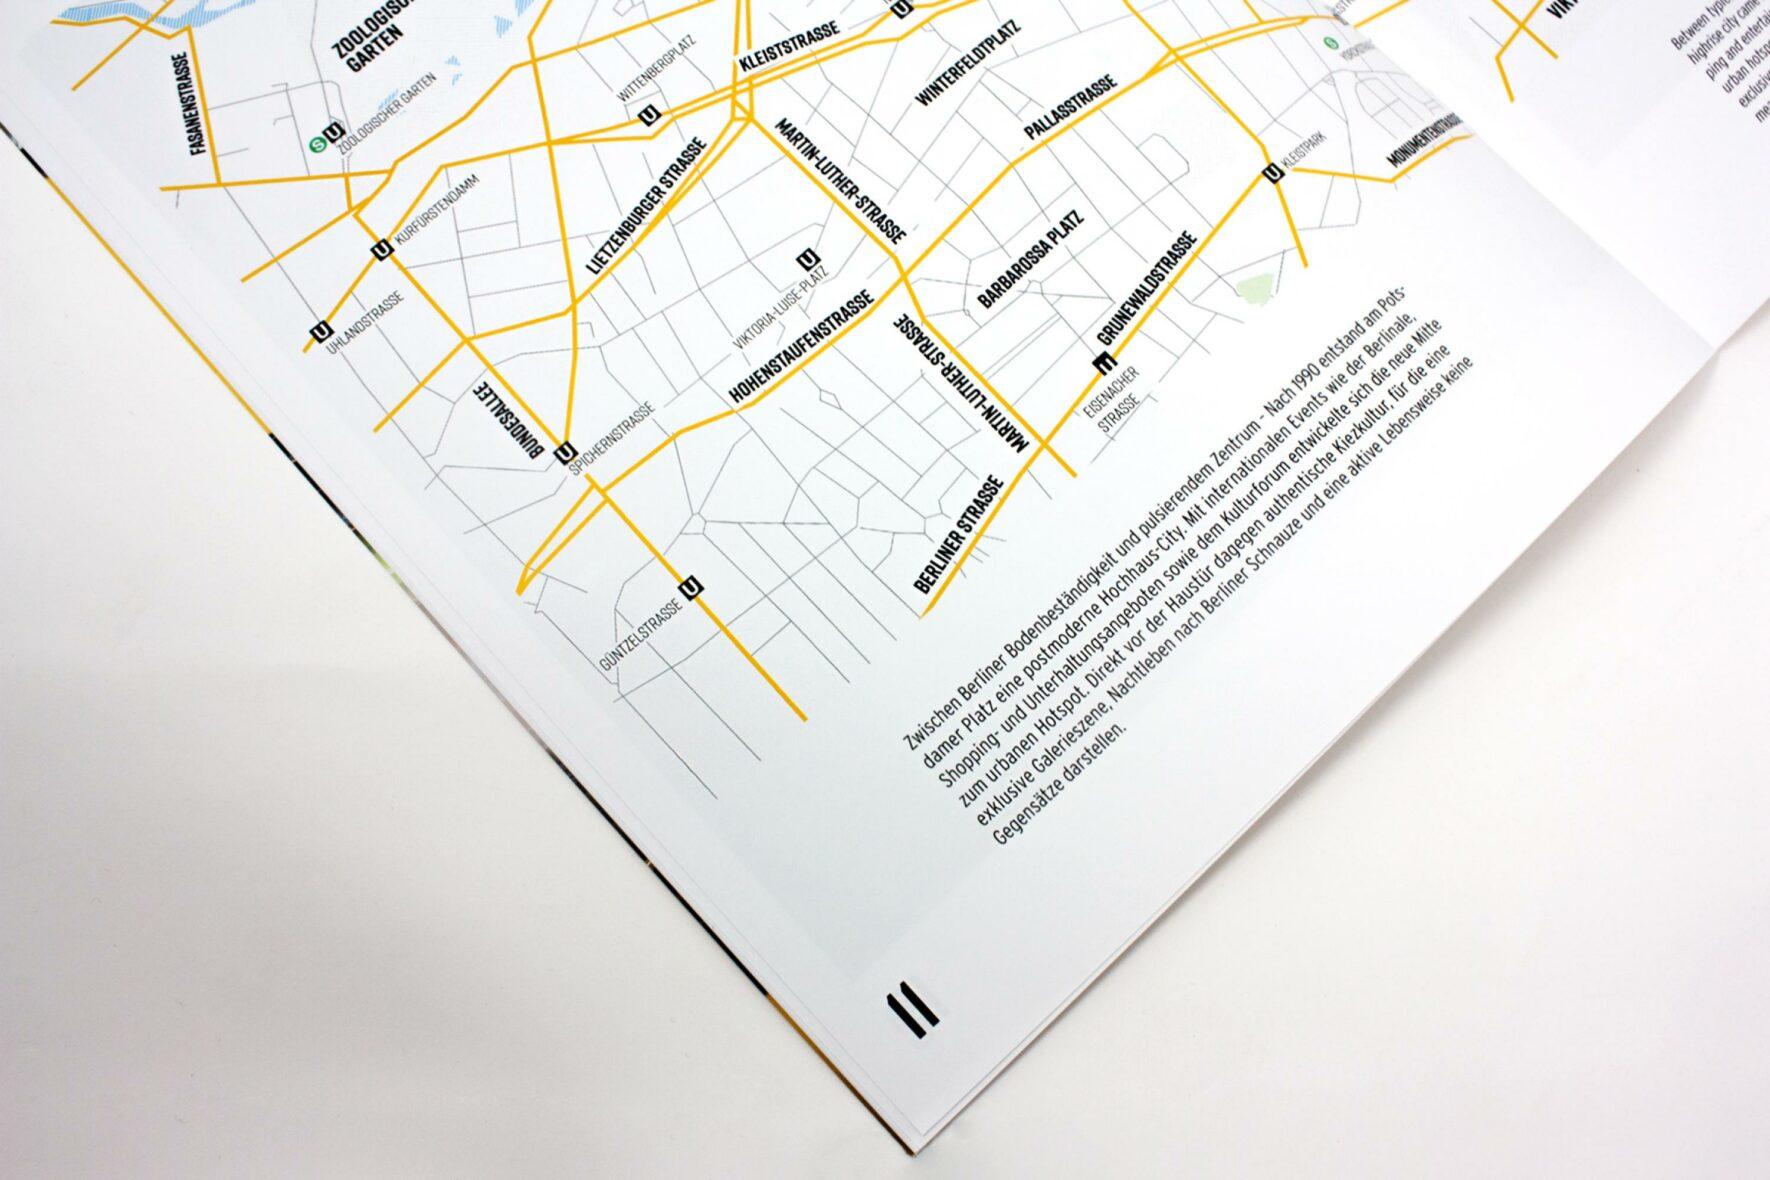 Immobilienbranding-Luetzow-Trendcity-Broschüre-FORMLOS-berlin-Print_MG_8355